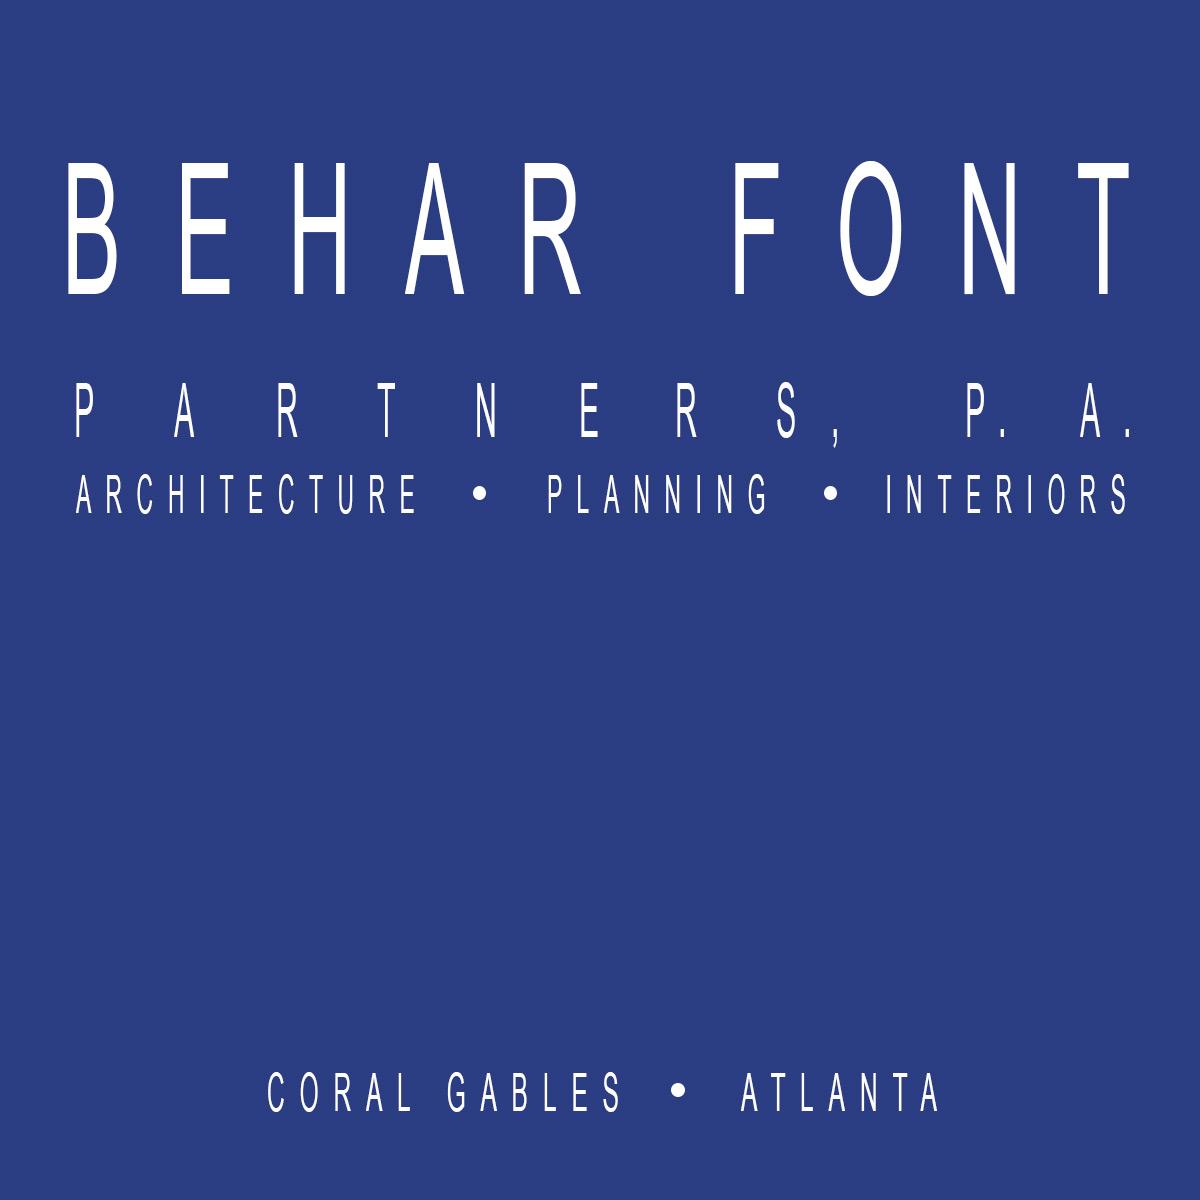 Behar Font & Partners, P.A.